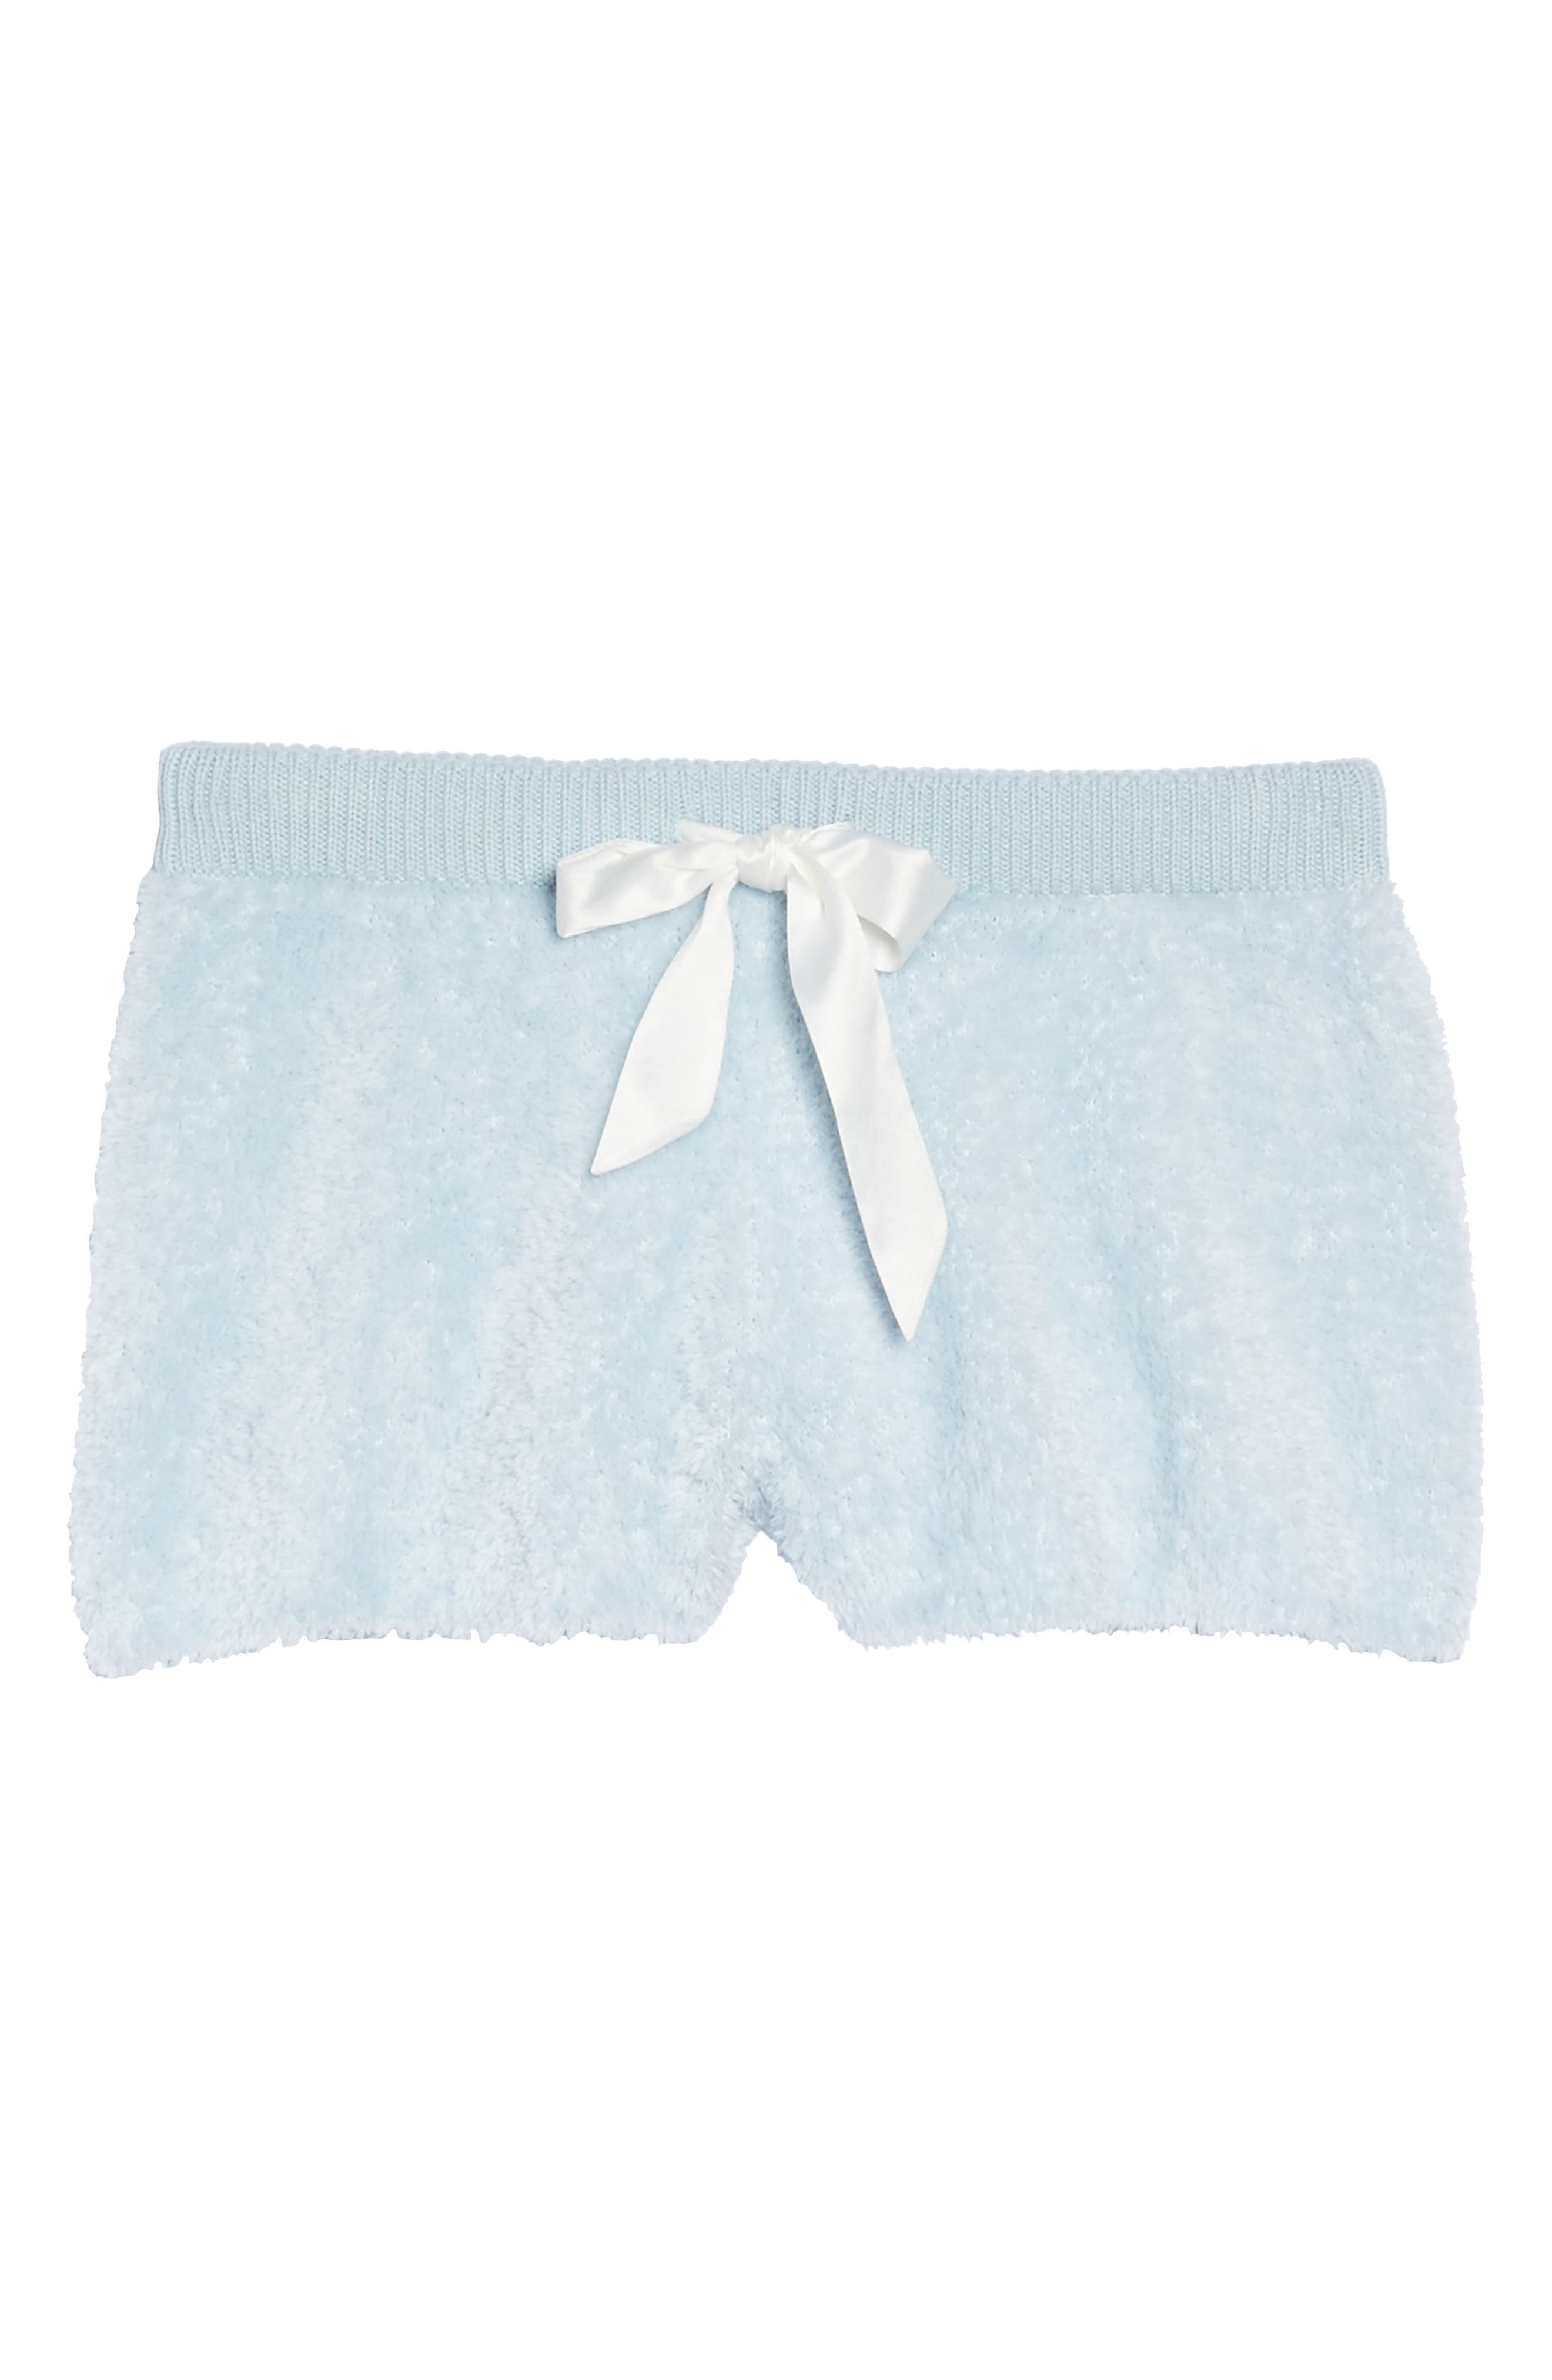 Fuzzy Lounge Shorts,                             Alternate thumbnail 4, color,                             Blue Drift